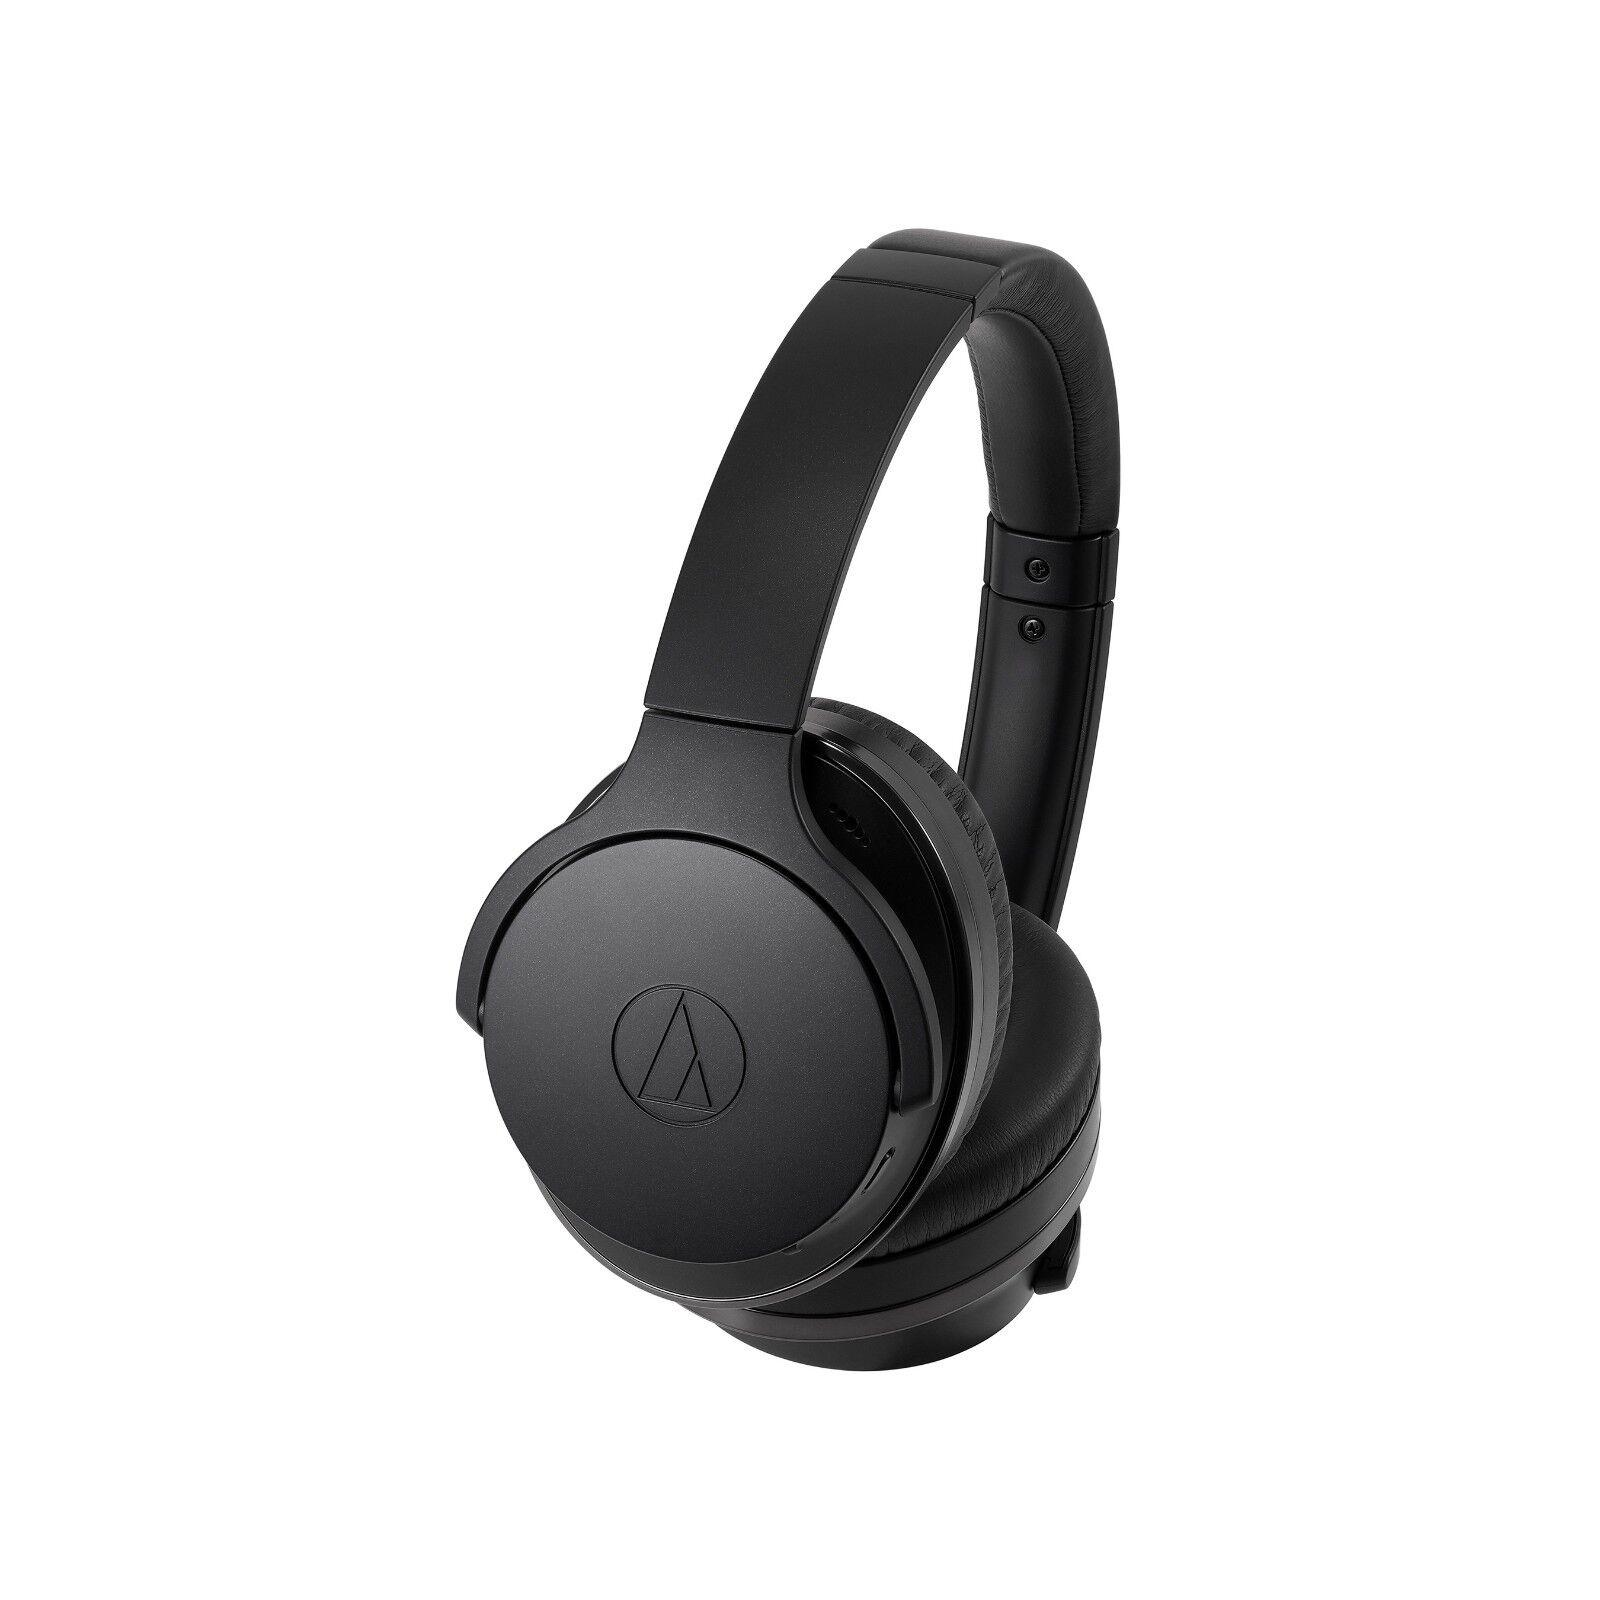 Audio-Technica ANC900BT Bluetooth Noise-Cancelling Headphone